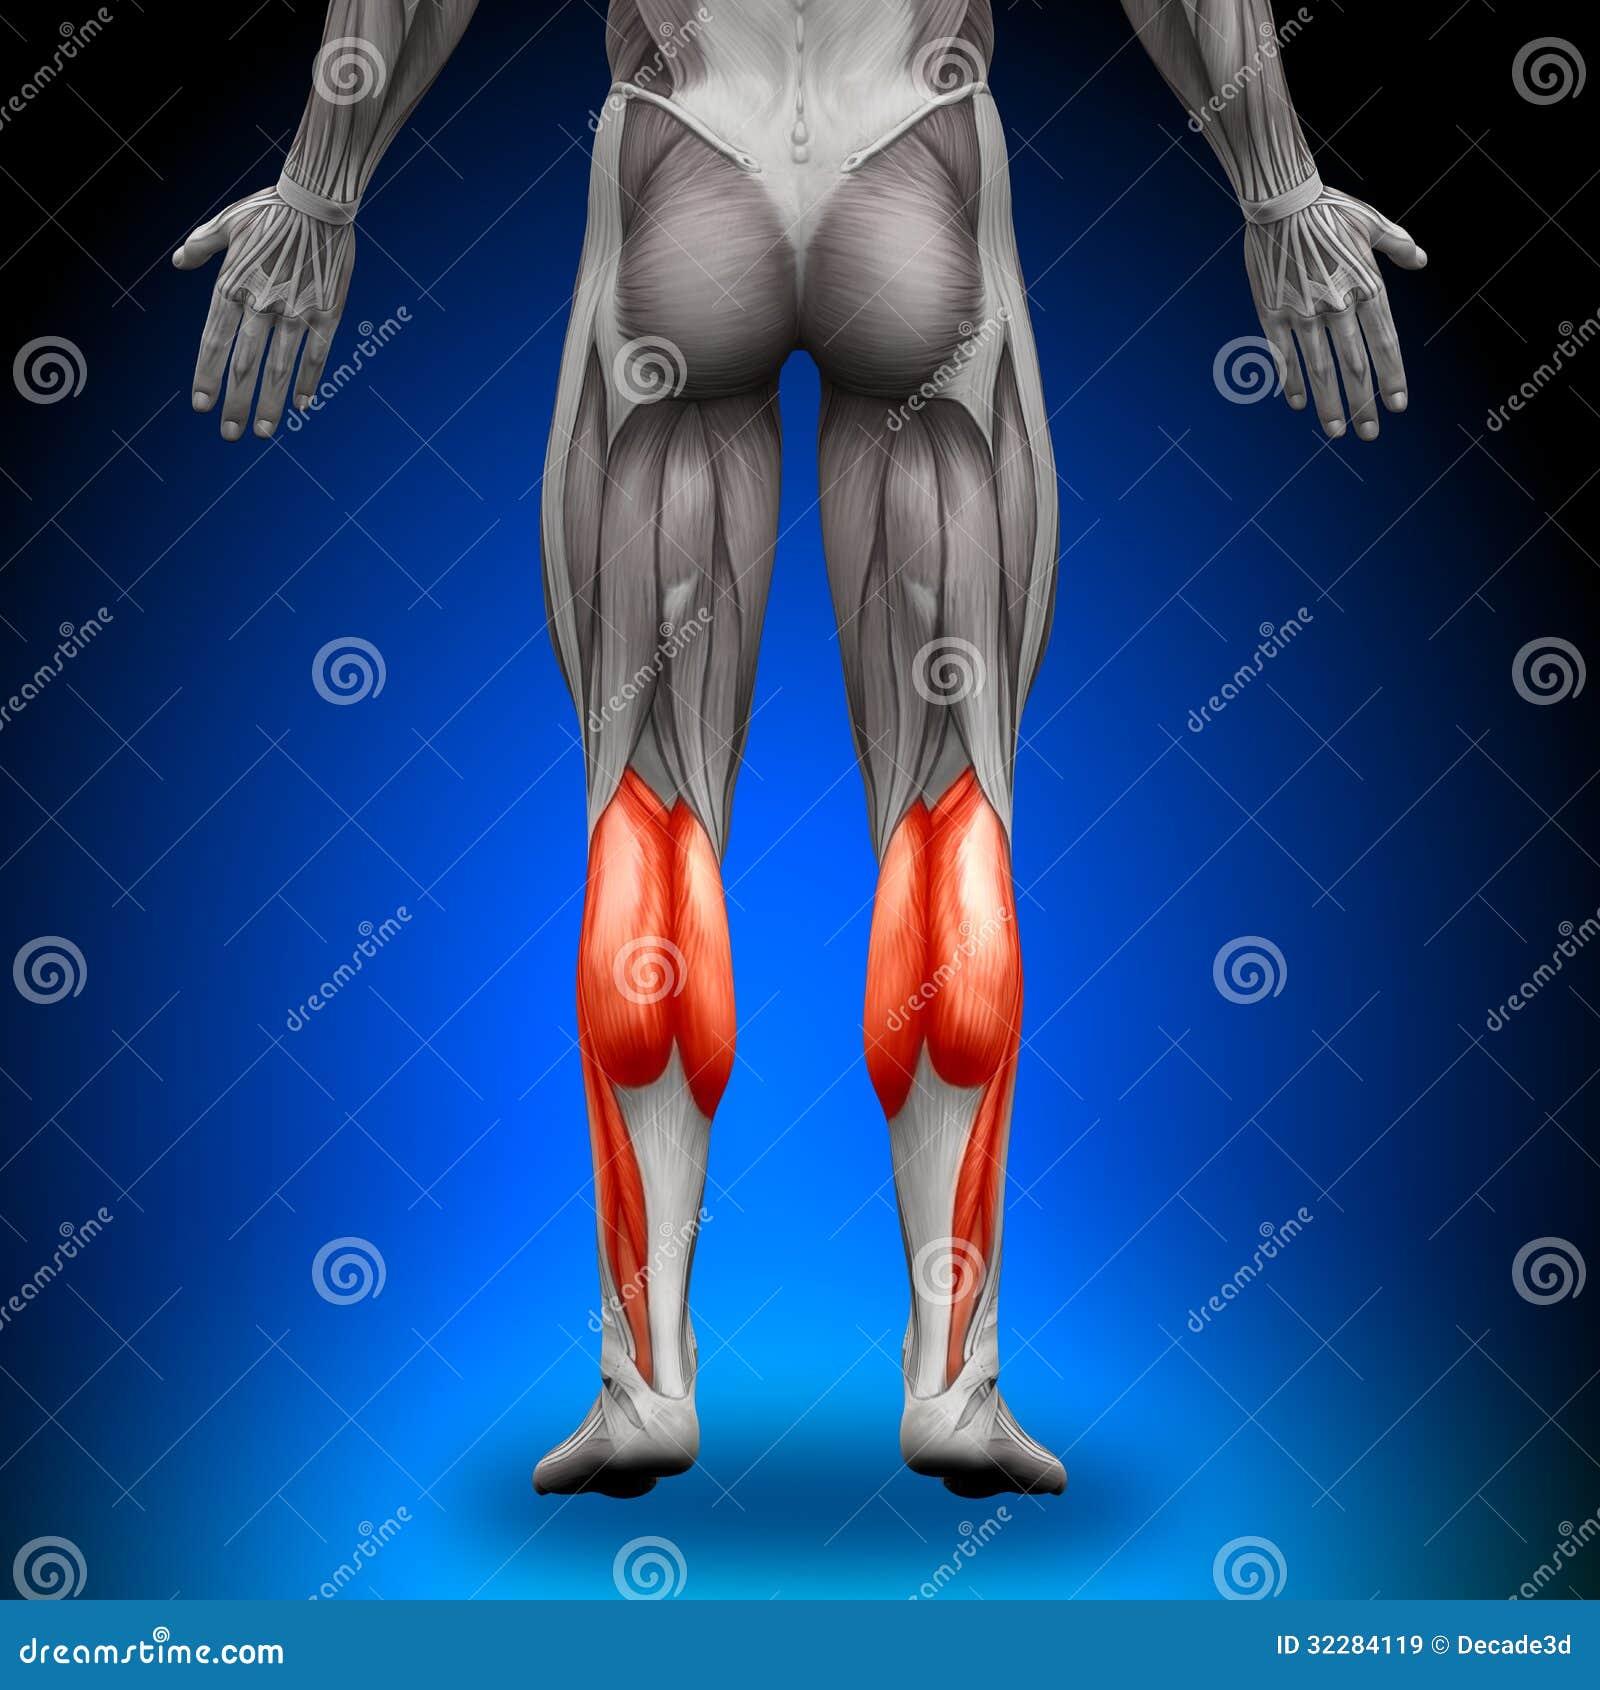 Calves - Anatomy Muscles stock illustration. Illustration of forearm ...